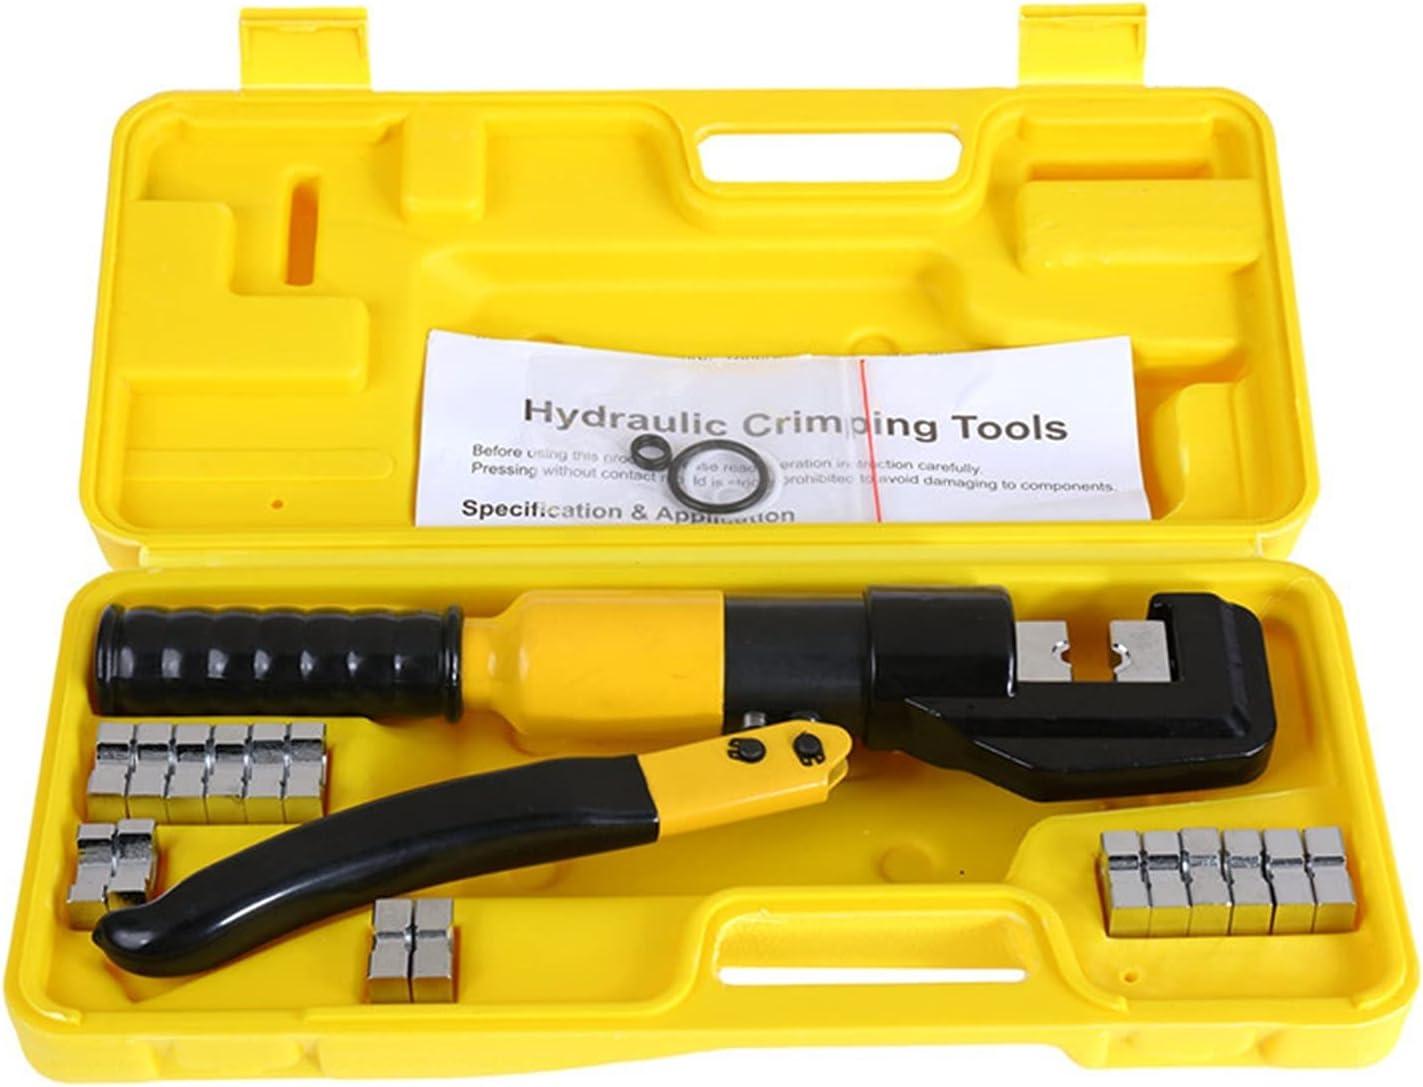 hydraulic tools Austin Mall Hydraulic Crimping Tool Under blast sales Cable Crimper Plier Lug